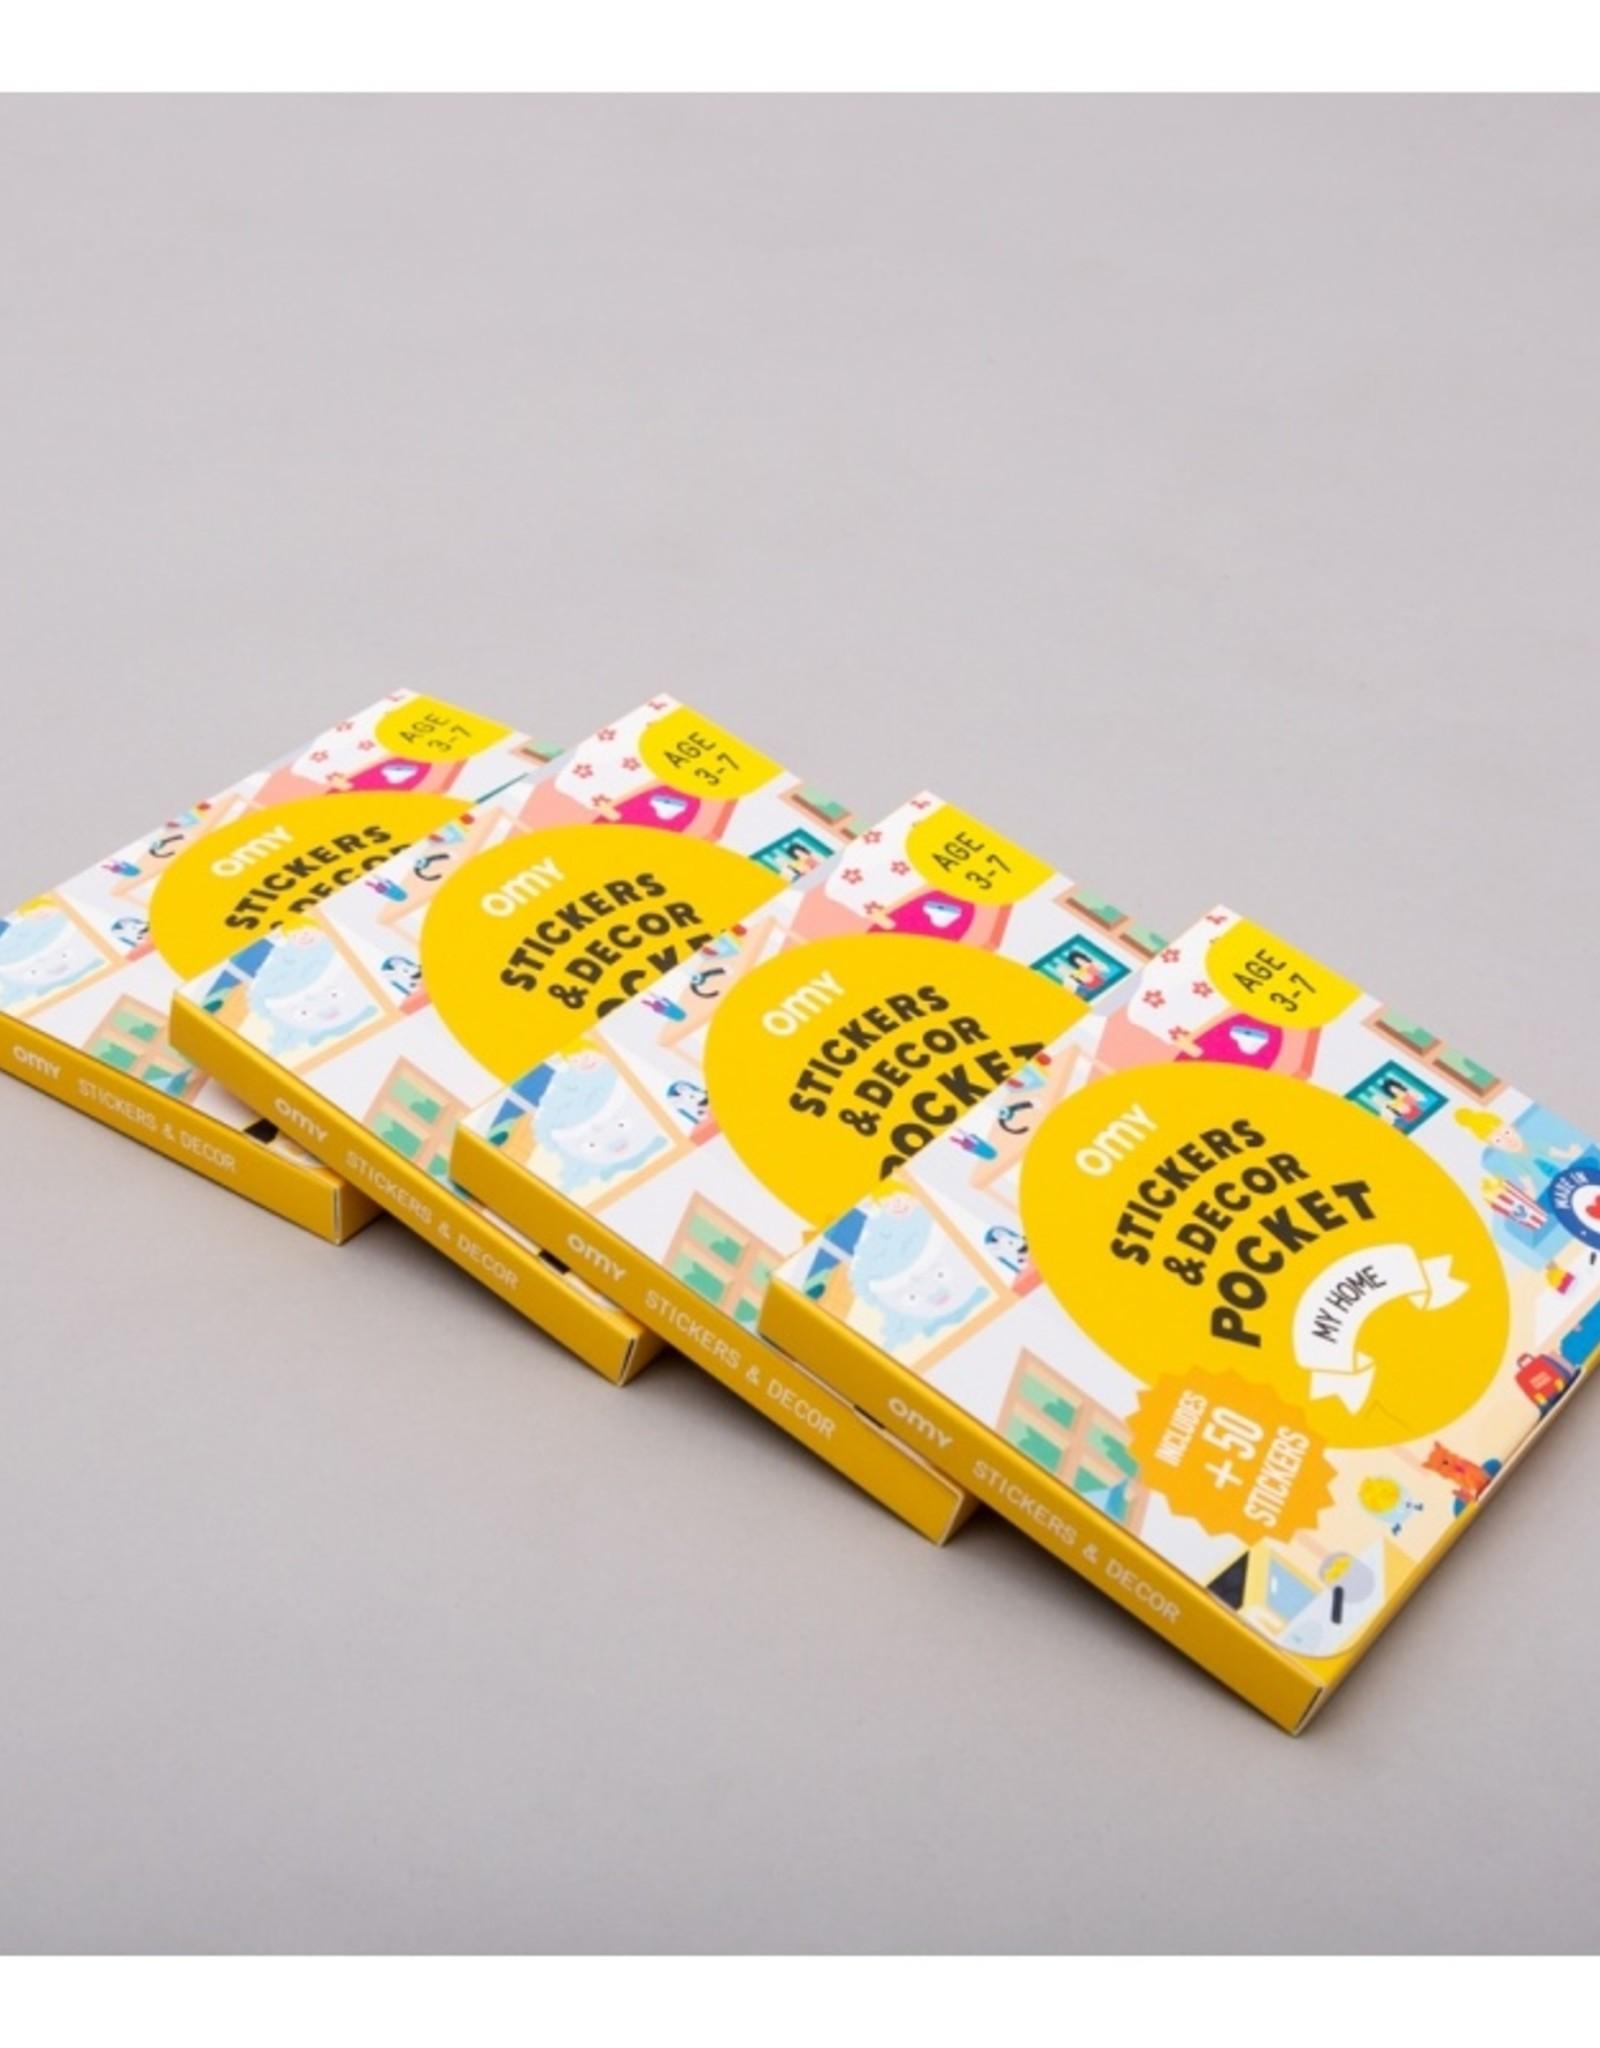 OMY Stickers & Decor Pocket My Home